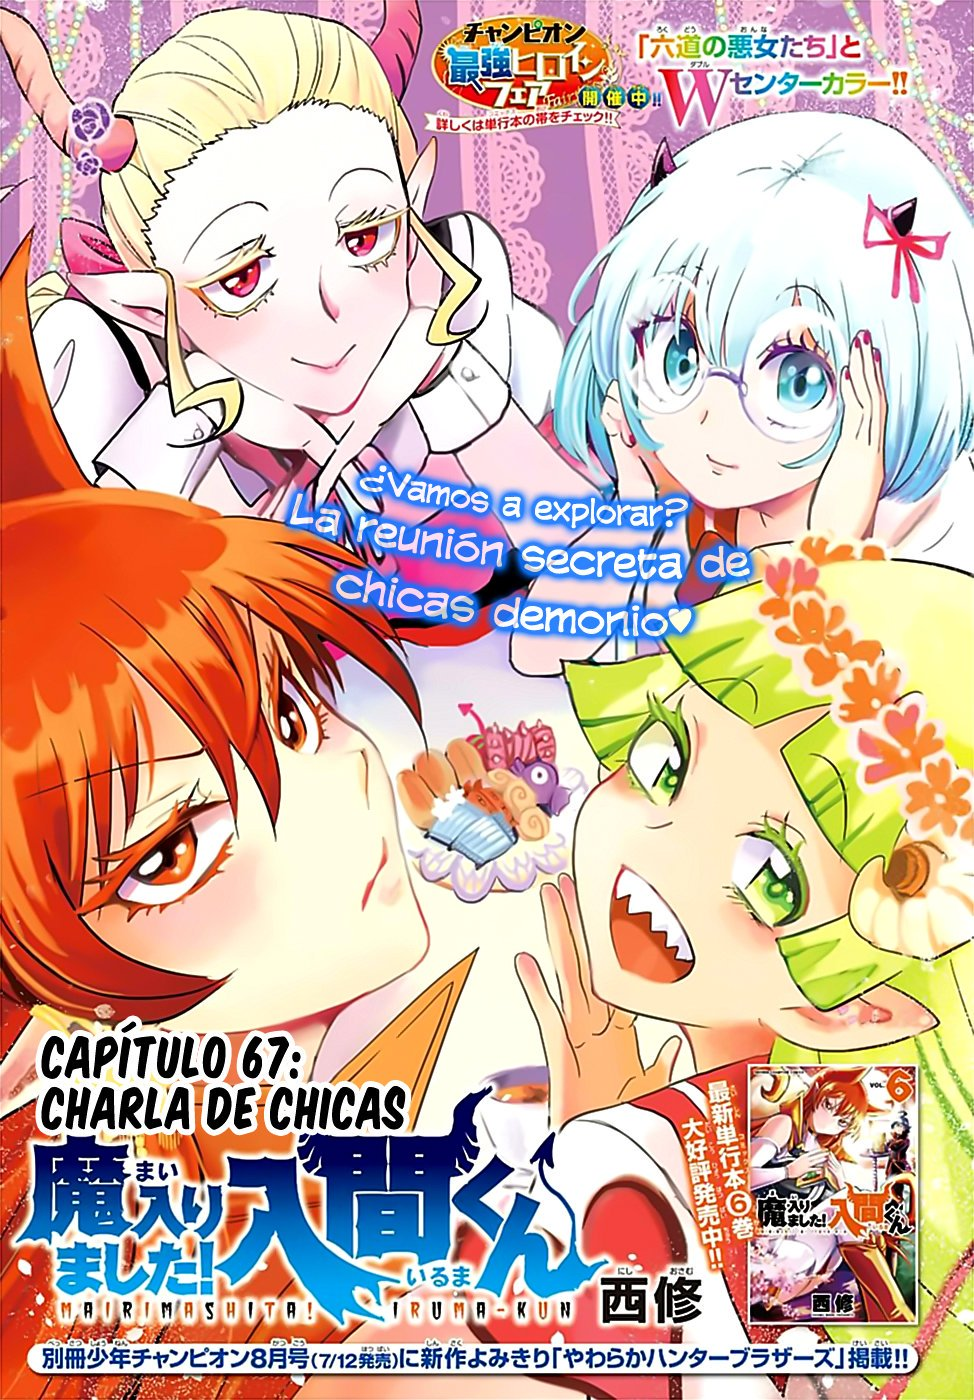 Mairimashita Iruma Kun Capitulo 67 Novel Cool Lee Novelas Ligeras En Linea Gratis Read Light Novels Online For Free Anime Nhật Ky Nghệ Thuật Nghệ Thuật